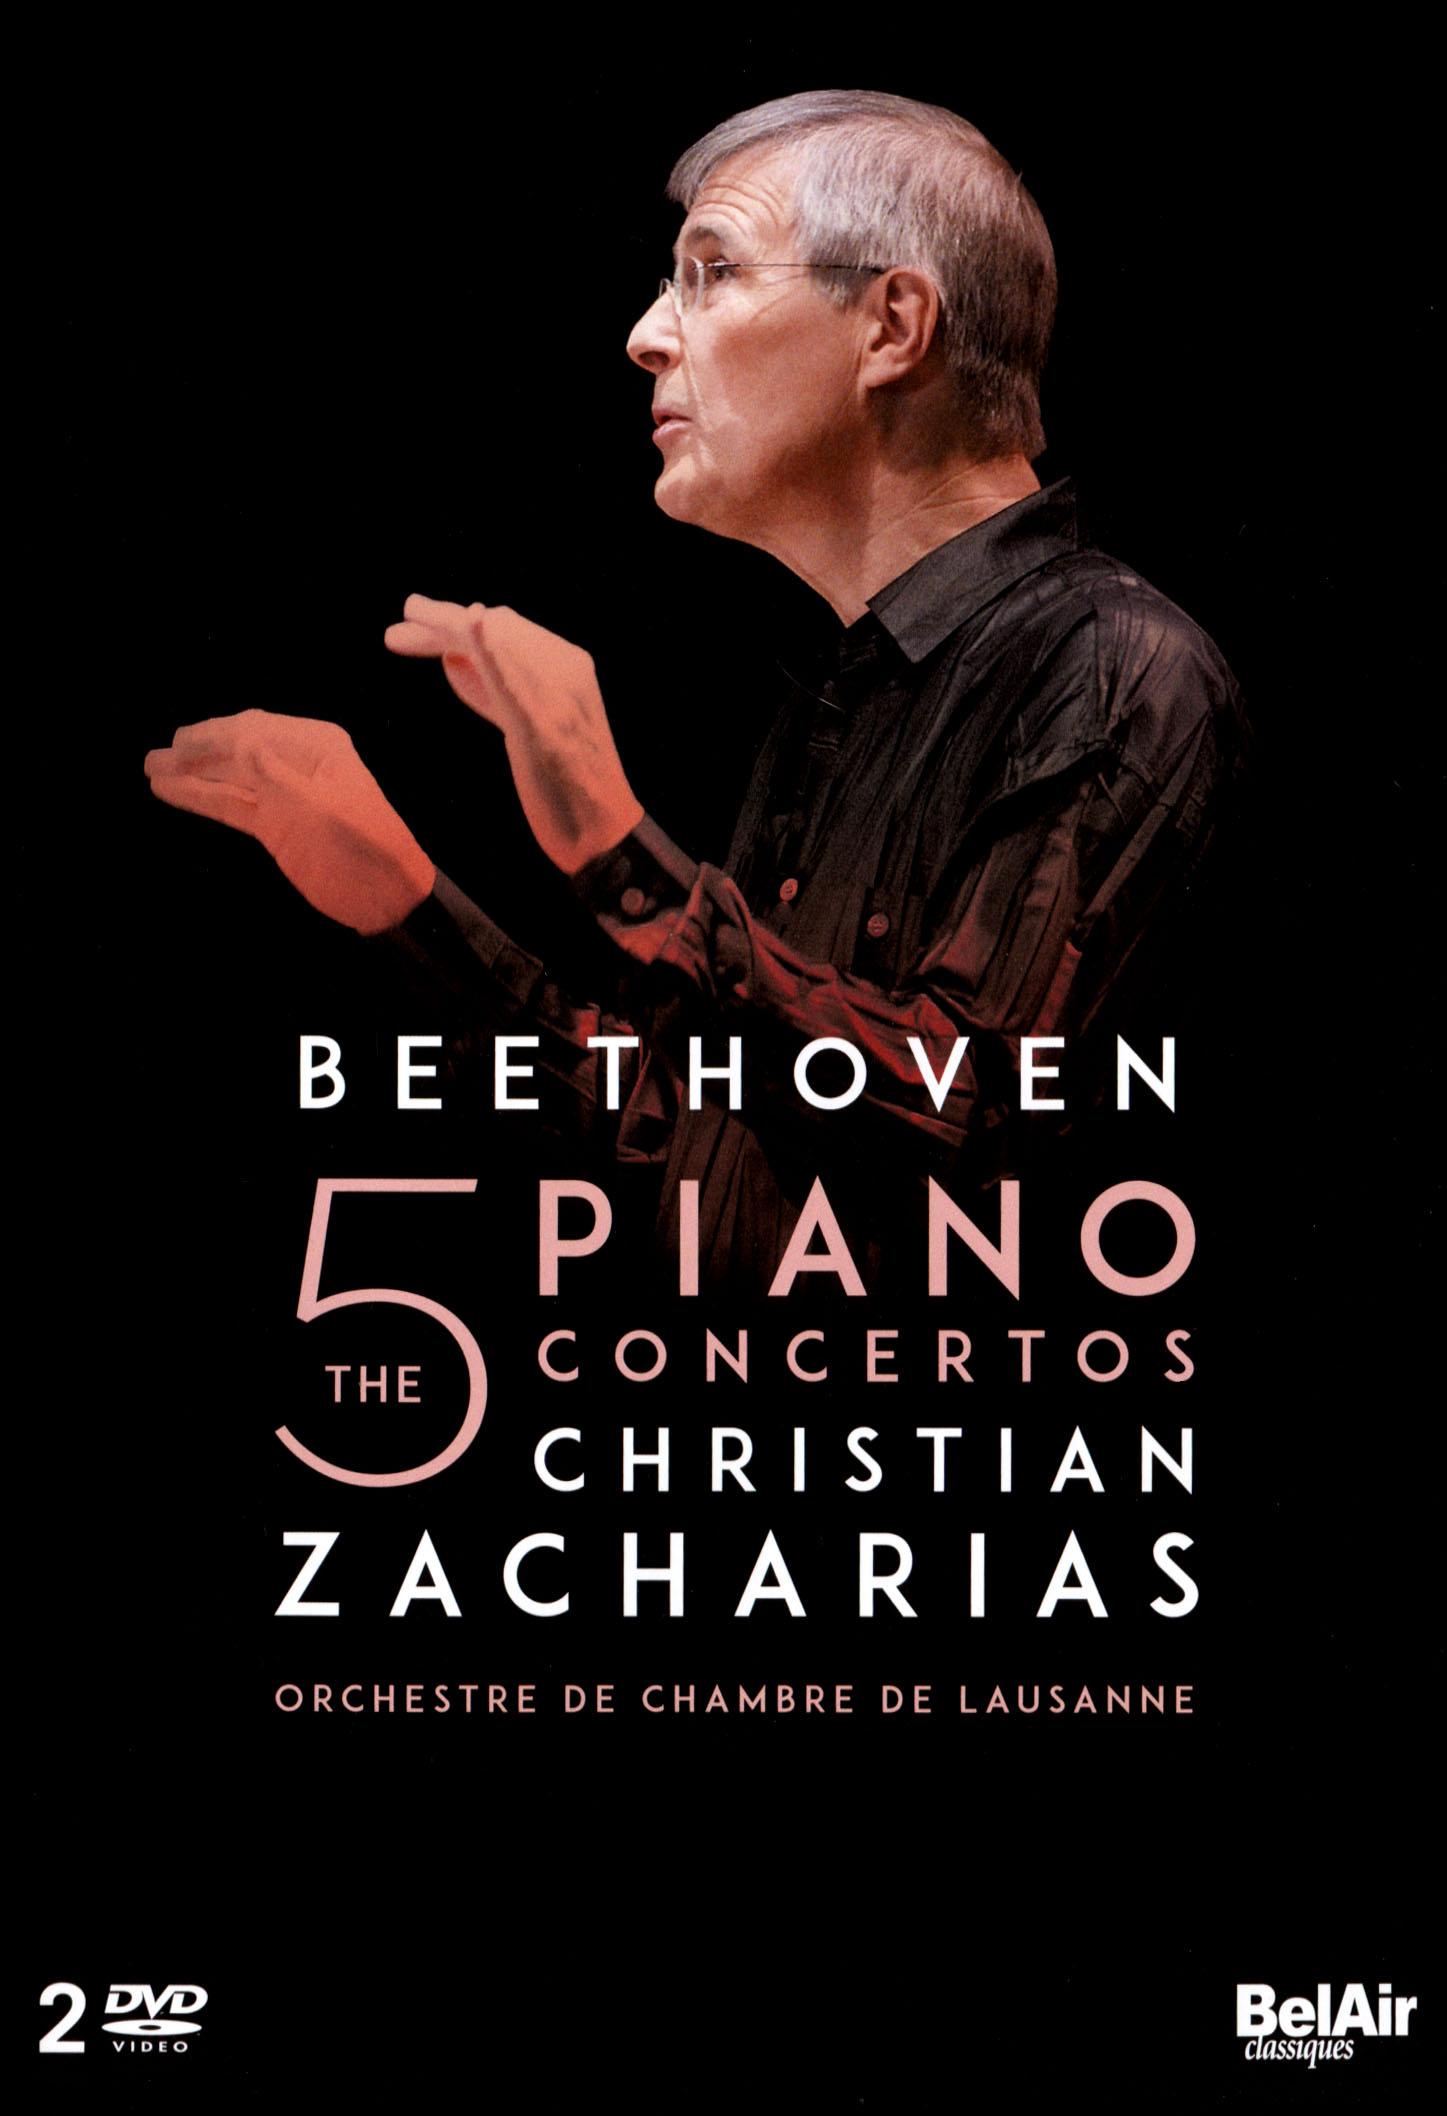 Christian Zacharias: Beethoven - The 5 Piano Concertos